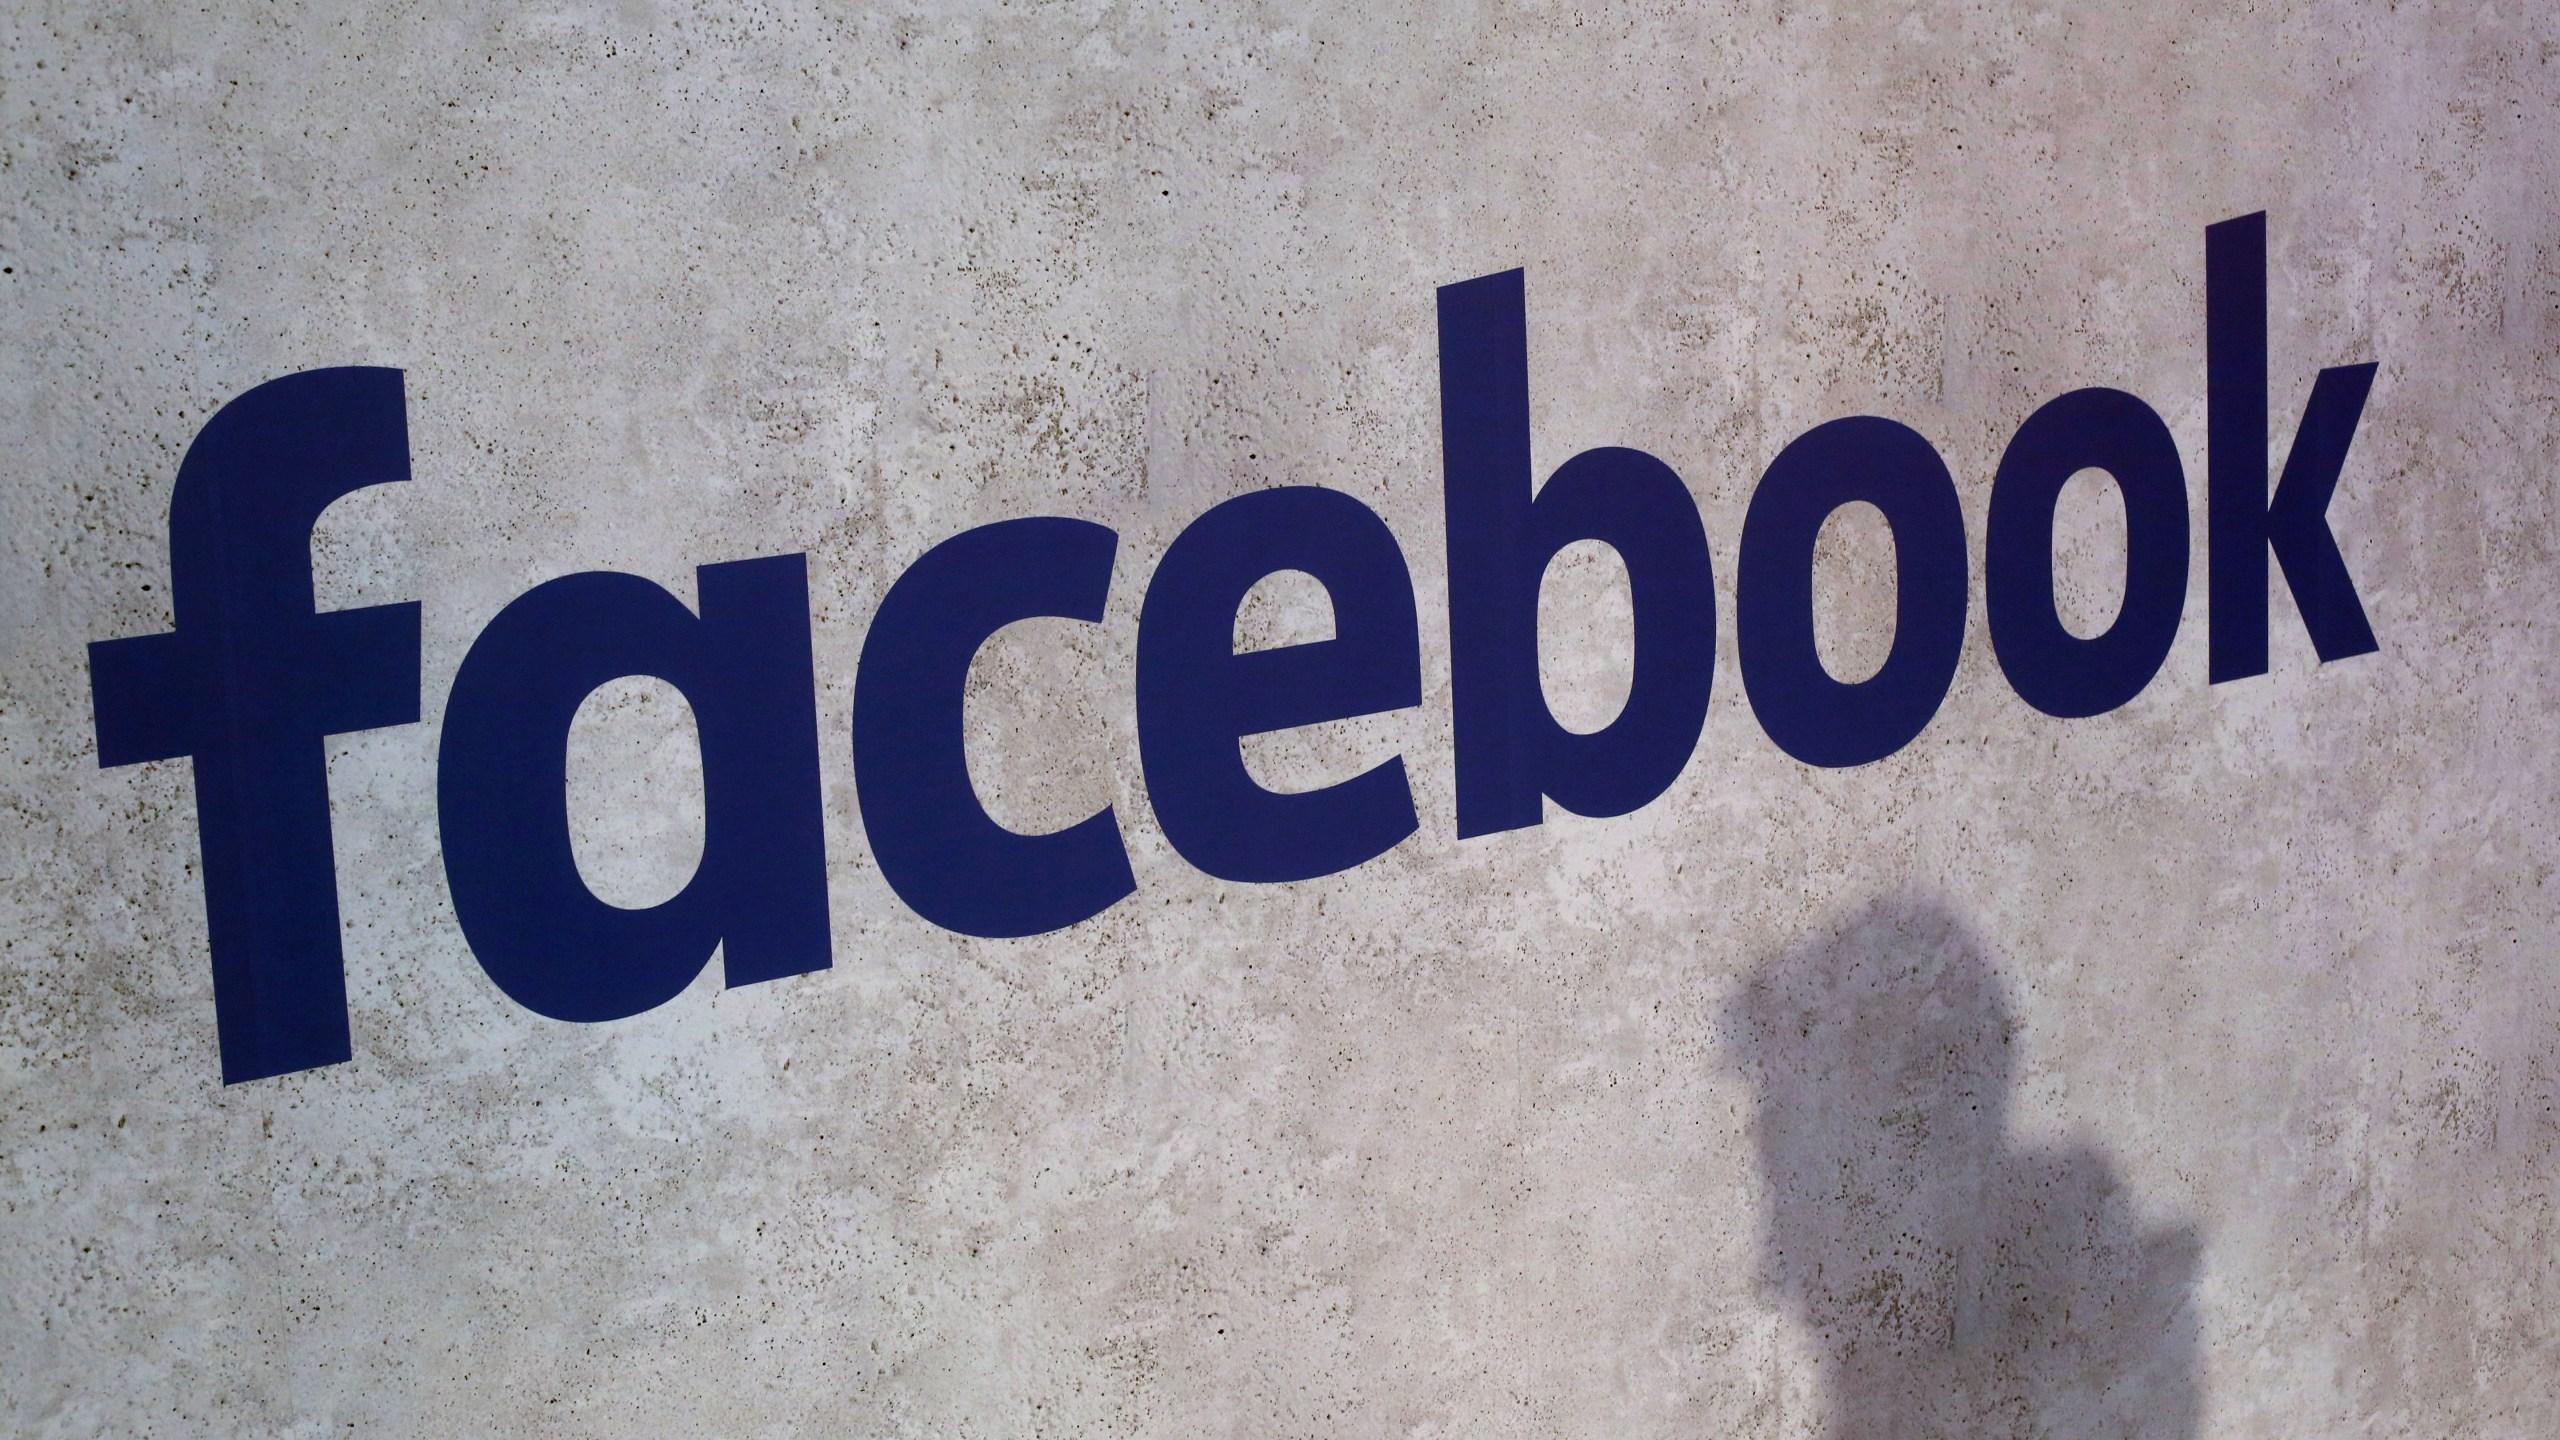 Facebook_Cambridge_Analytica_Whistleblower_45141-159532.jpg53052724